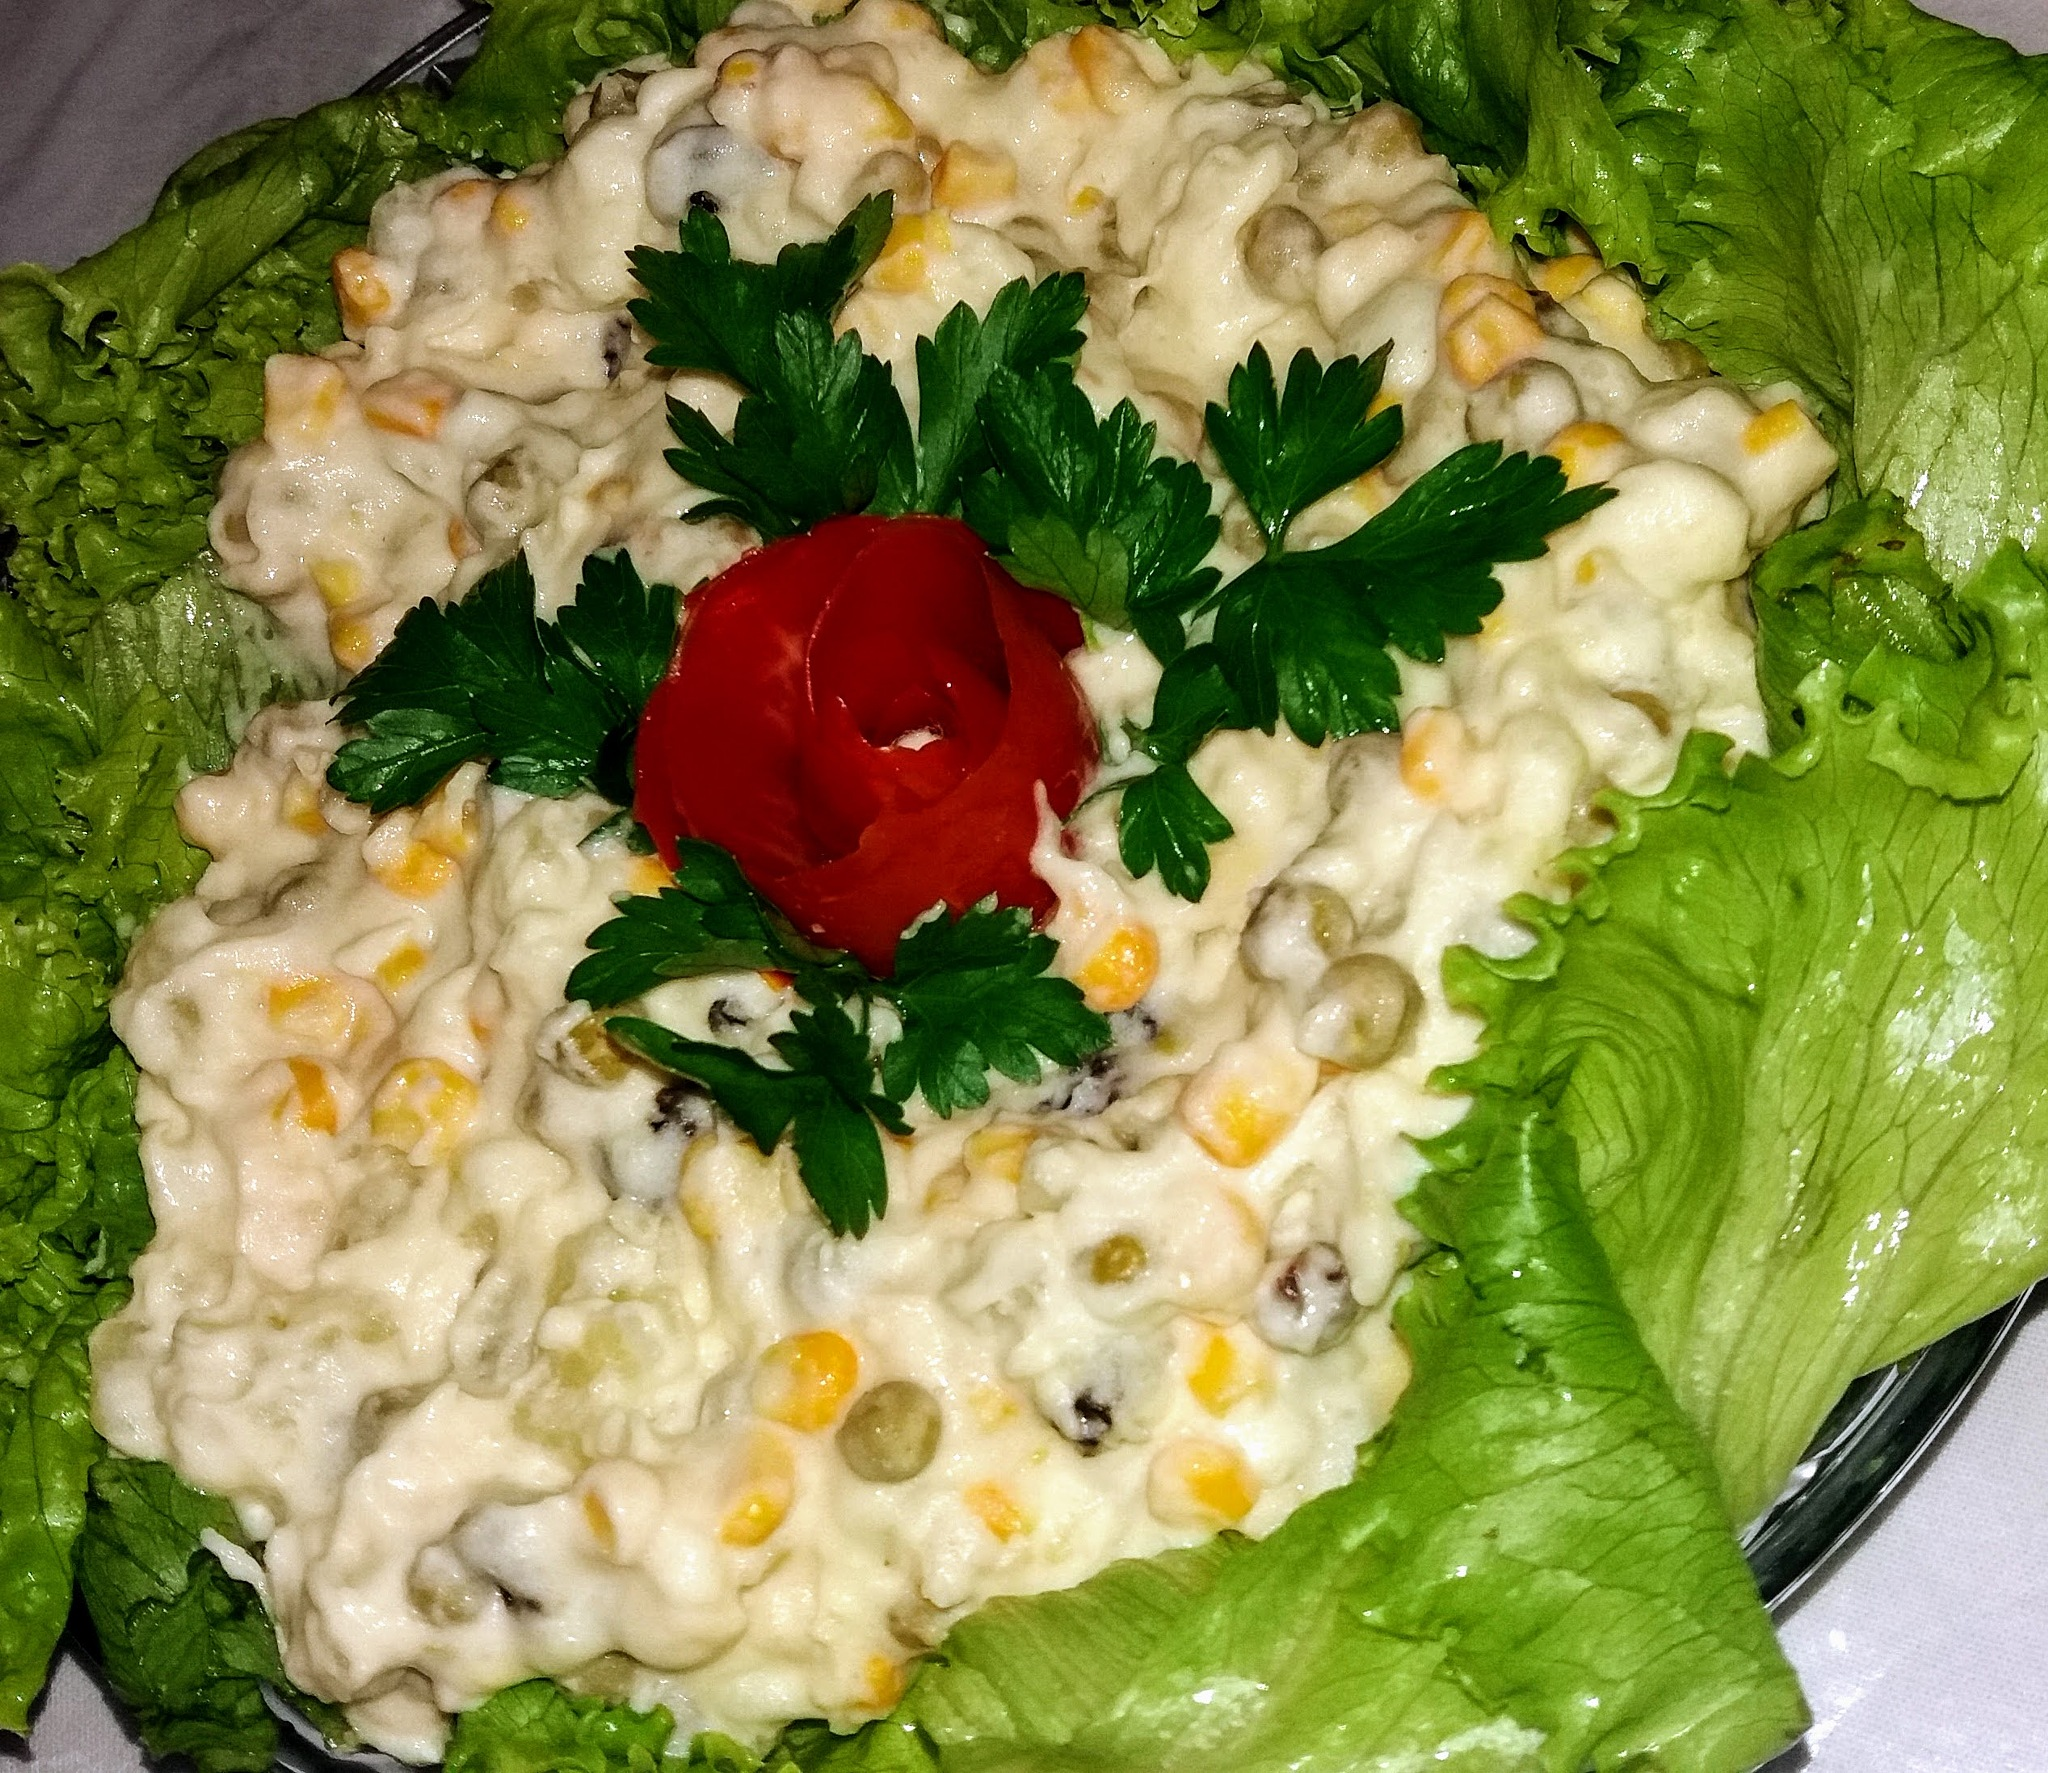 Mayonnaise salad by Sonja